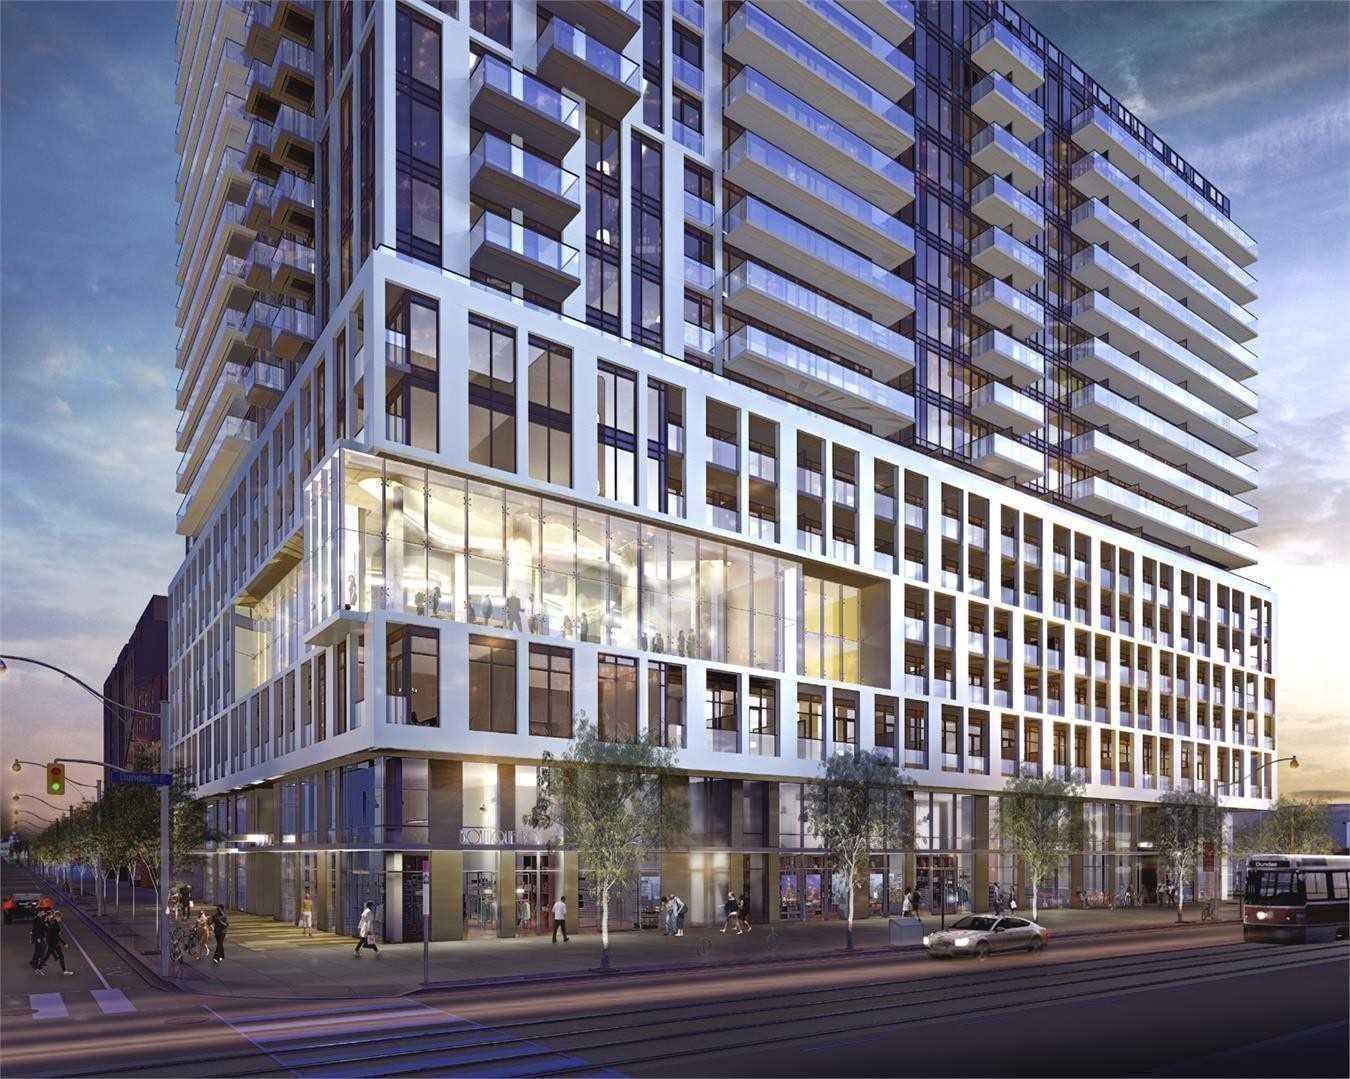 251 Jarvis St, Toronto, Ontario M5B 0C3, 2 Bedrooms Bedrooms, ,1 BathroomBathrooms,Condo Apt,For Lease,Jarvis,C5221056